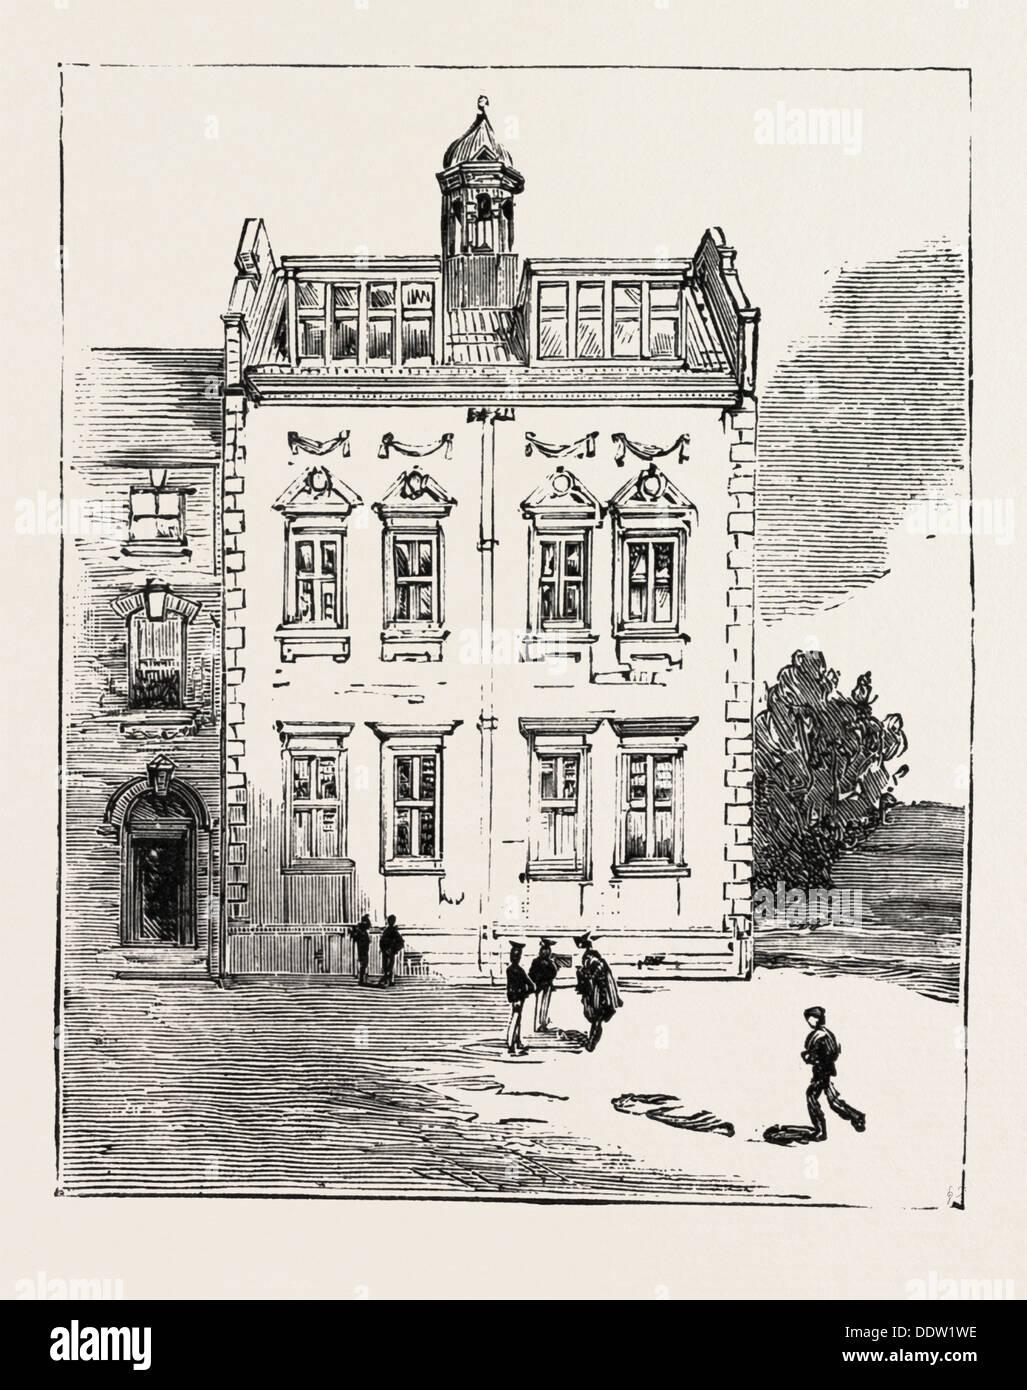 ADDITION TO THE GRAMMAR SCHOOL BEDFORD, ENGRAVING 1884, UK, britain, british, europe, united kingdom, great britain, european - Stock Image